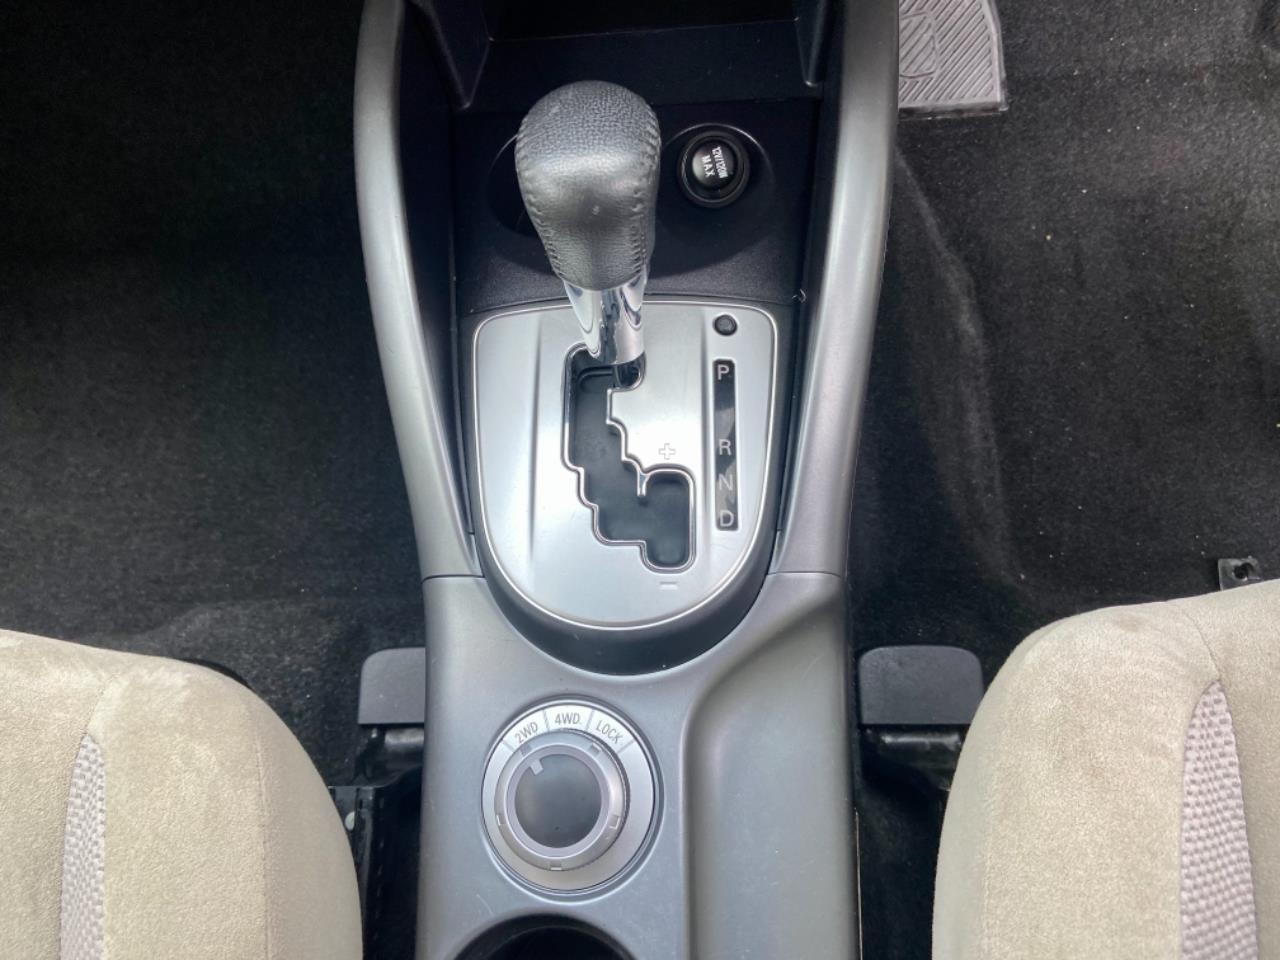 image-14, 2010 Mitsubishi Outlander 24G 4WD 7 Seater Facelif at Christchurch